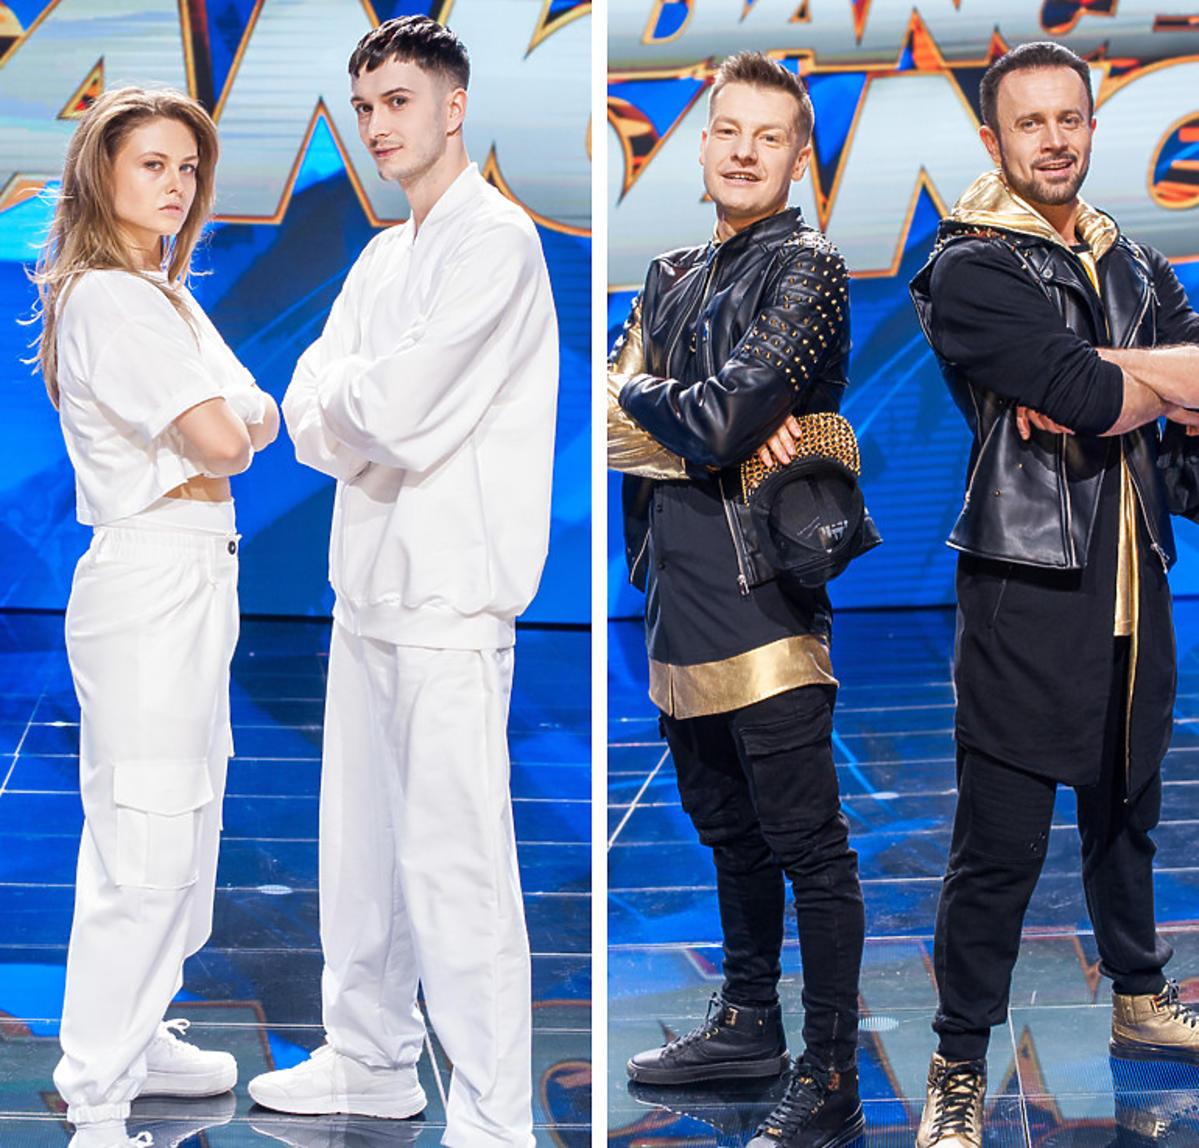 Dance Dance Dance - Ania i Mateusz oraz Rafał i Przemek